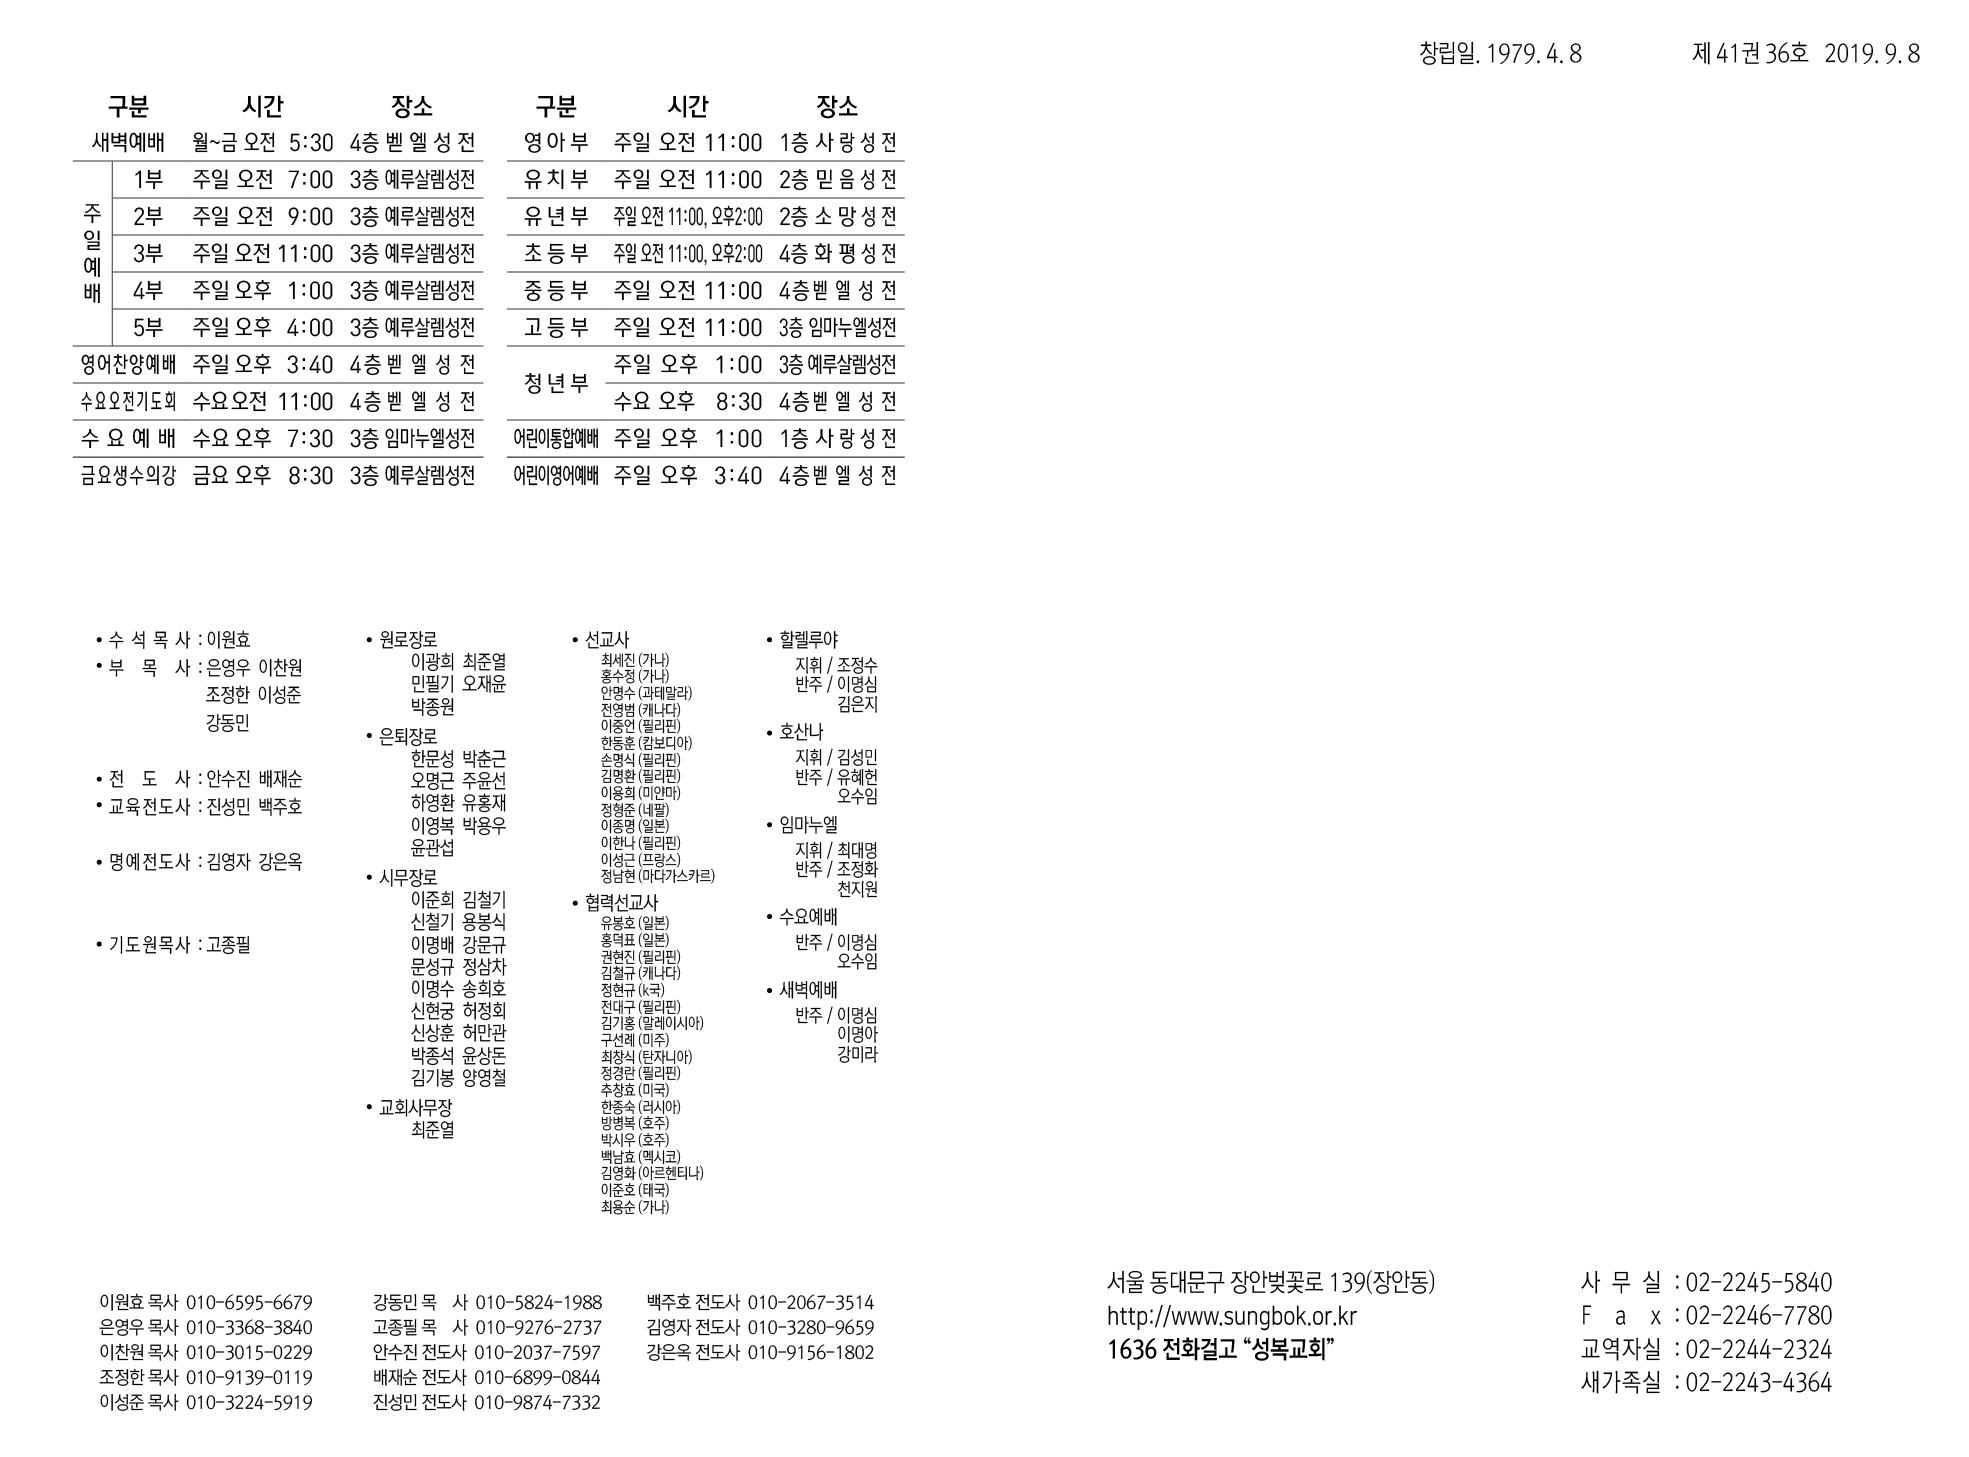 2893b22f112d54b3f2504b99110a59cd.jpg